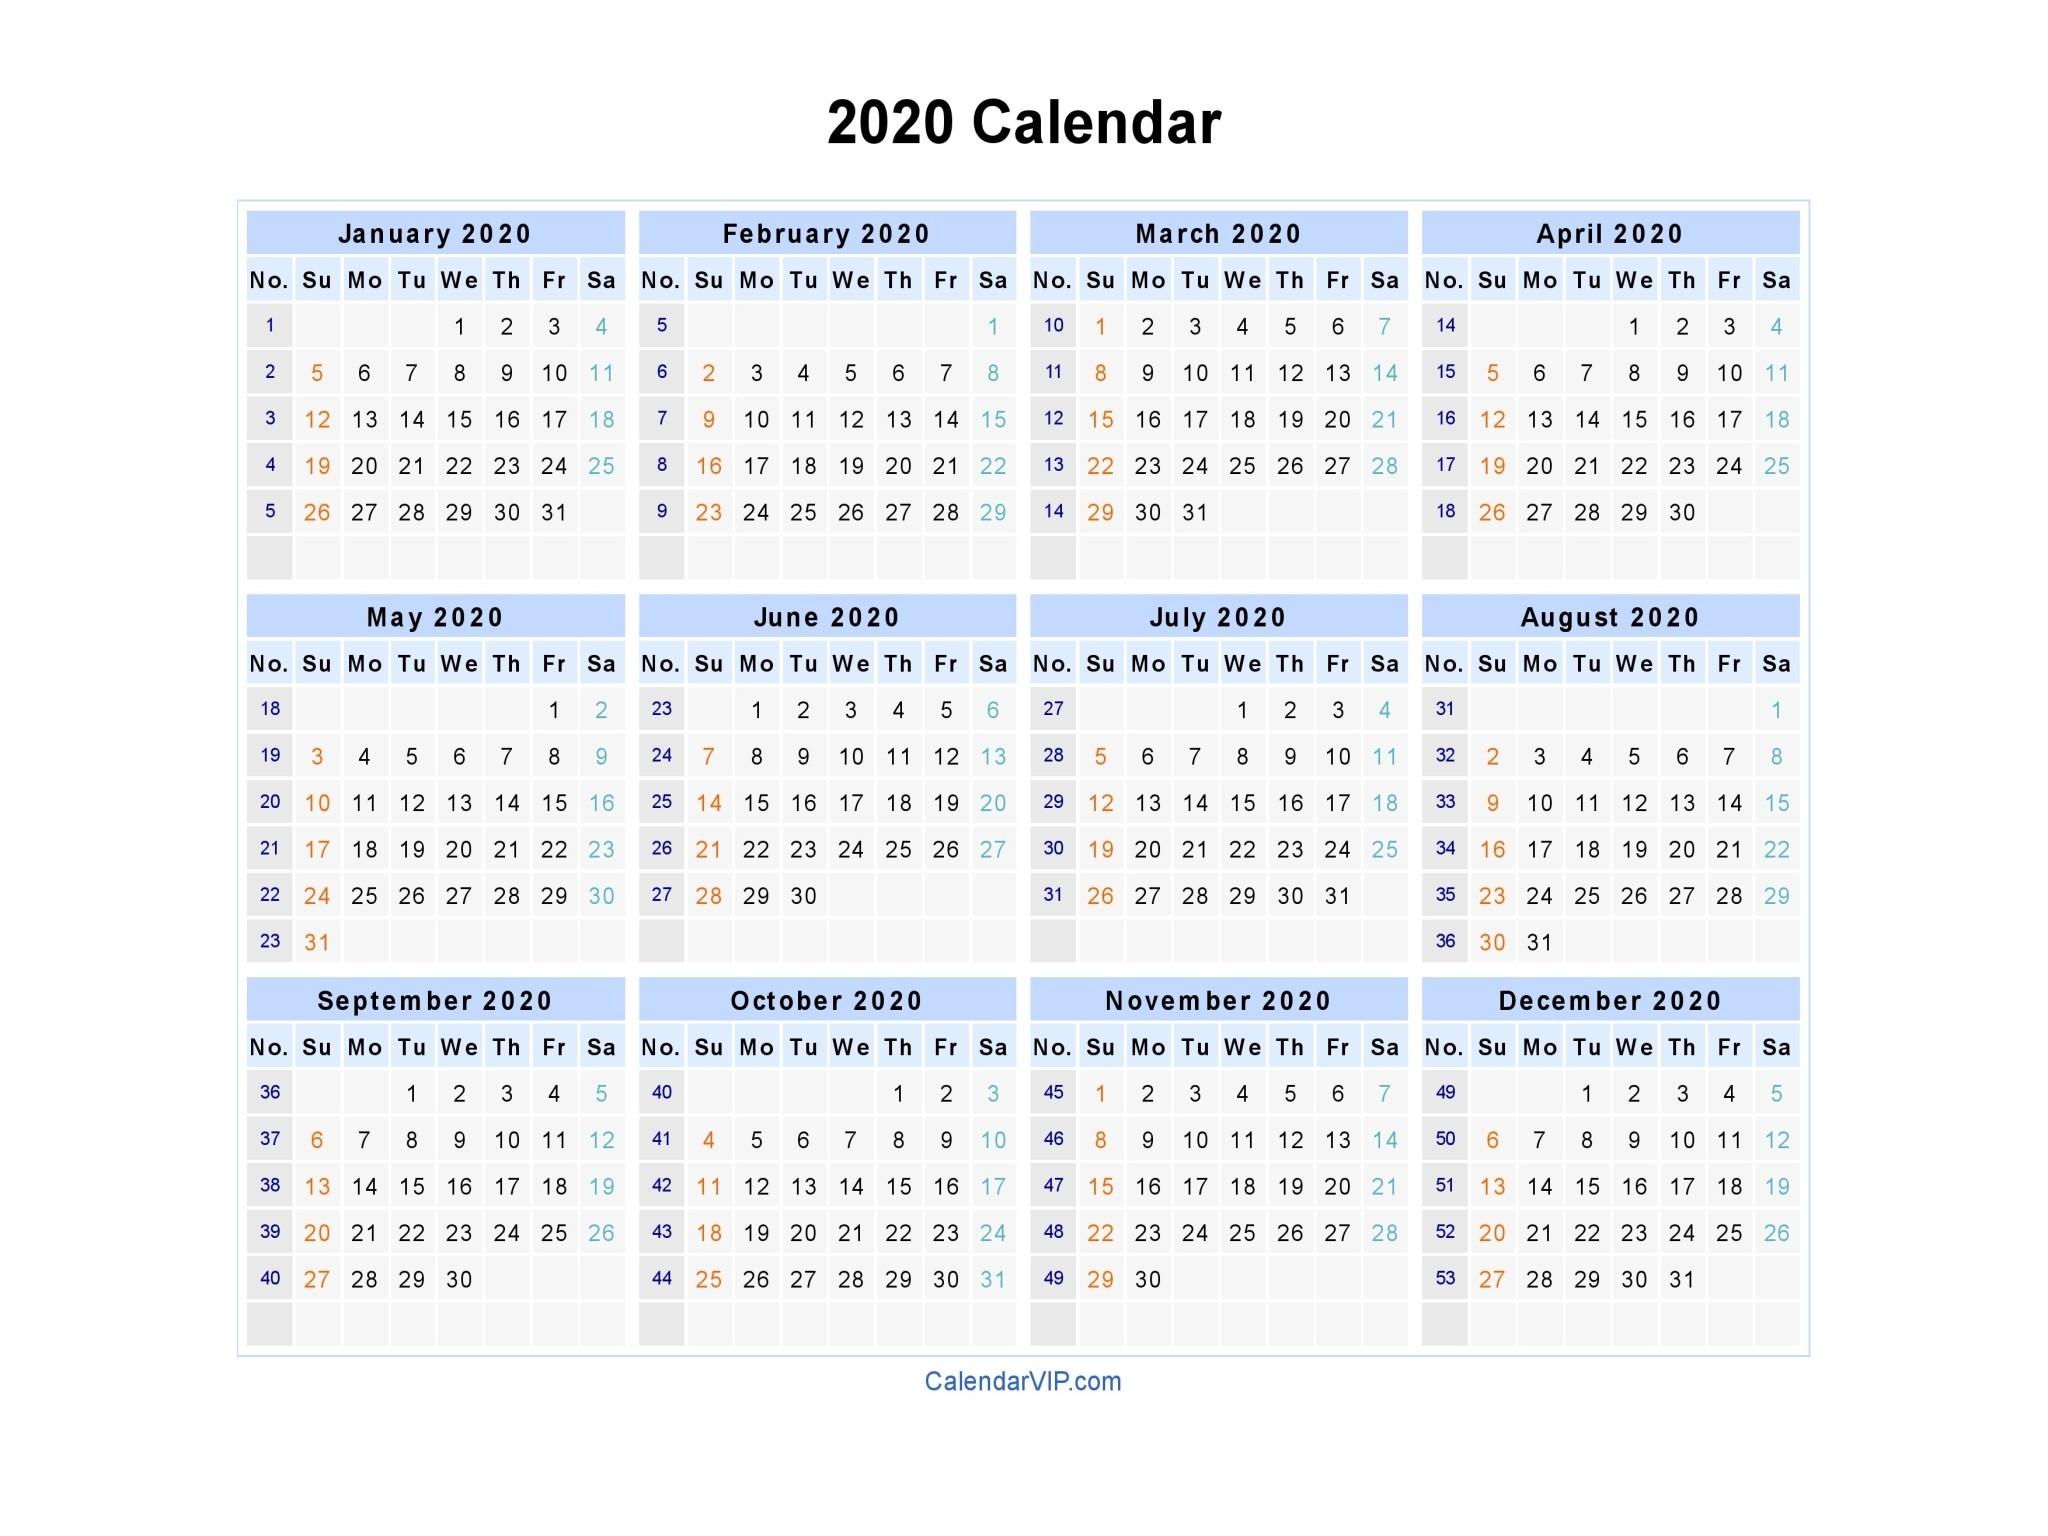 2020 Calendar - Blank Printable Calendar Template In Pdf-4 Month Excel Calendar 2020 Template